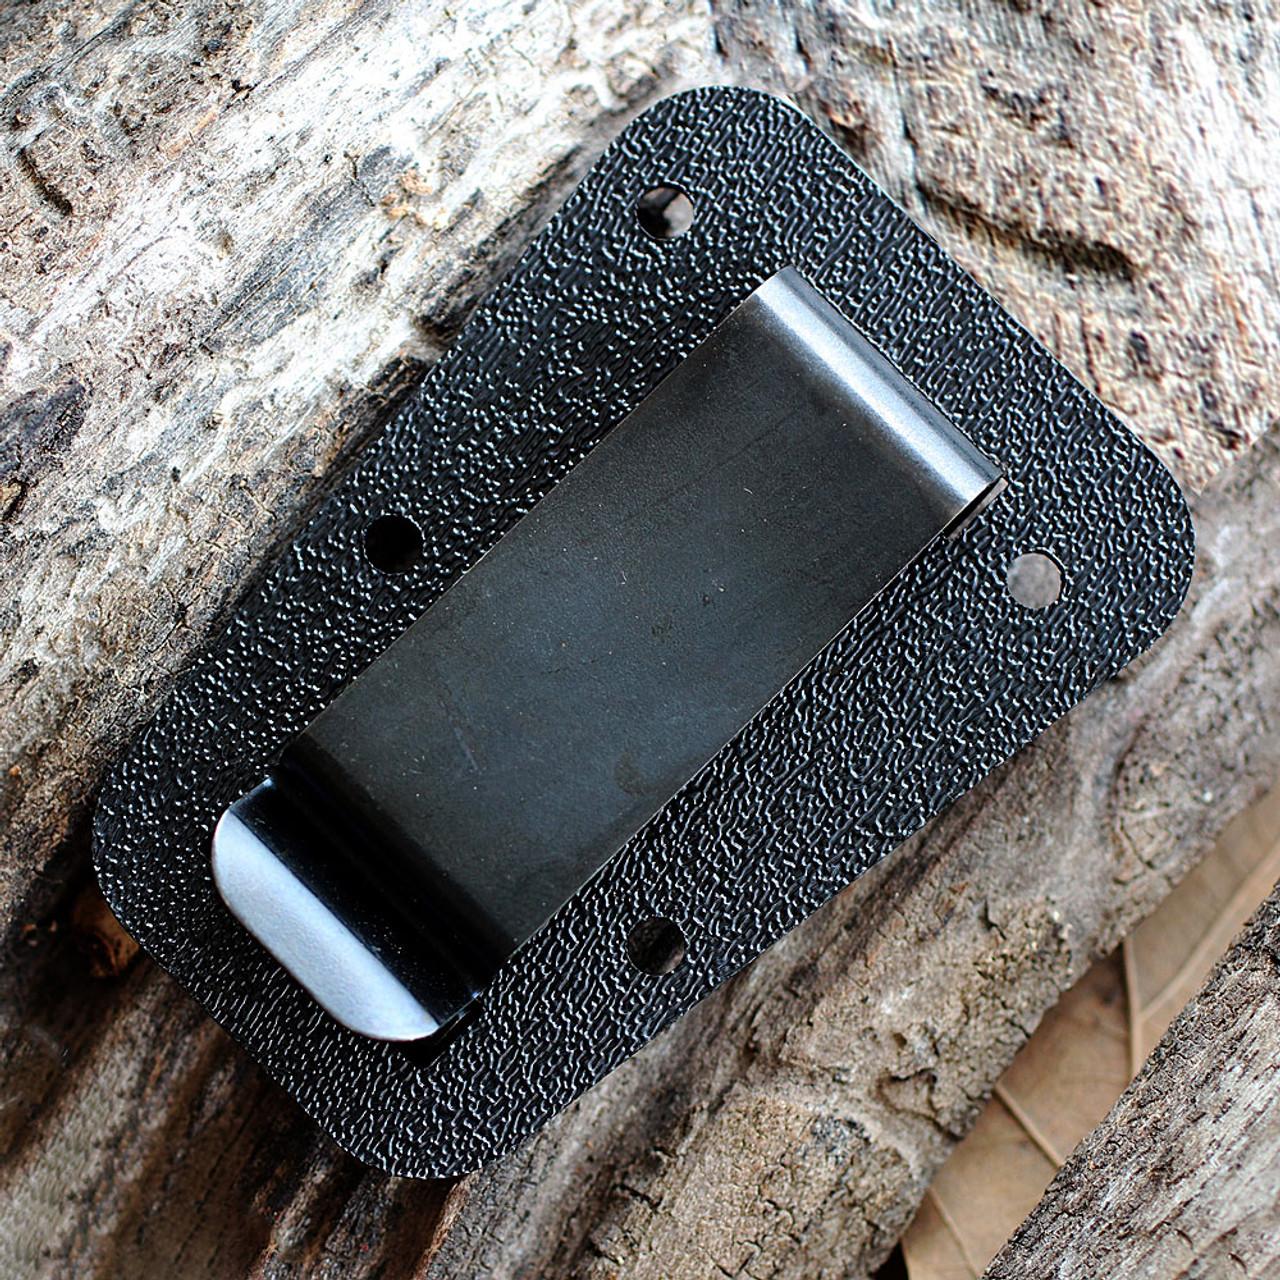 ESEE IZULA Knife, Desert Tan, Concealed Carry Knife, Clip Plate